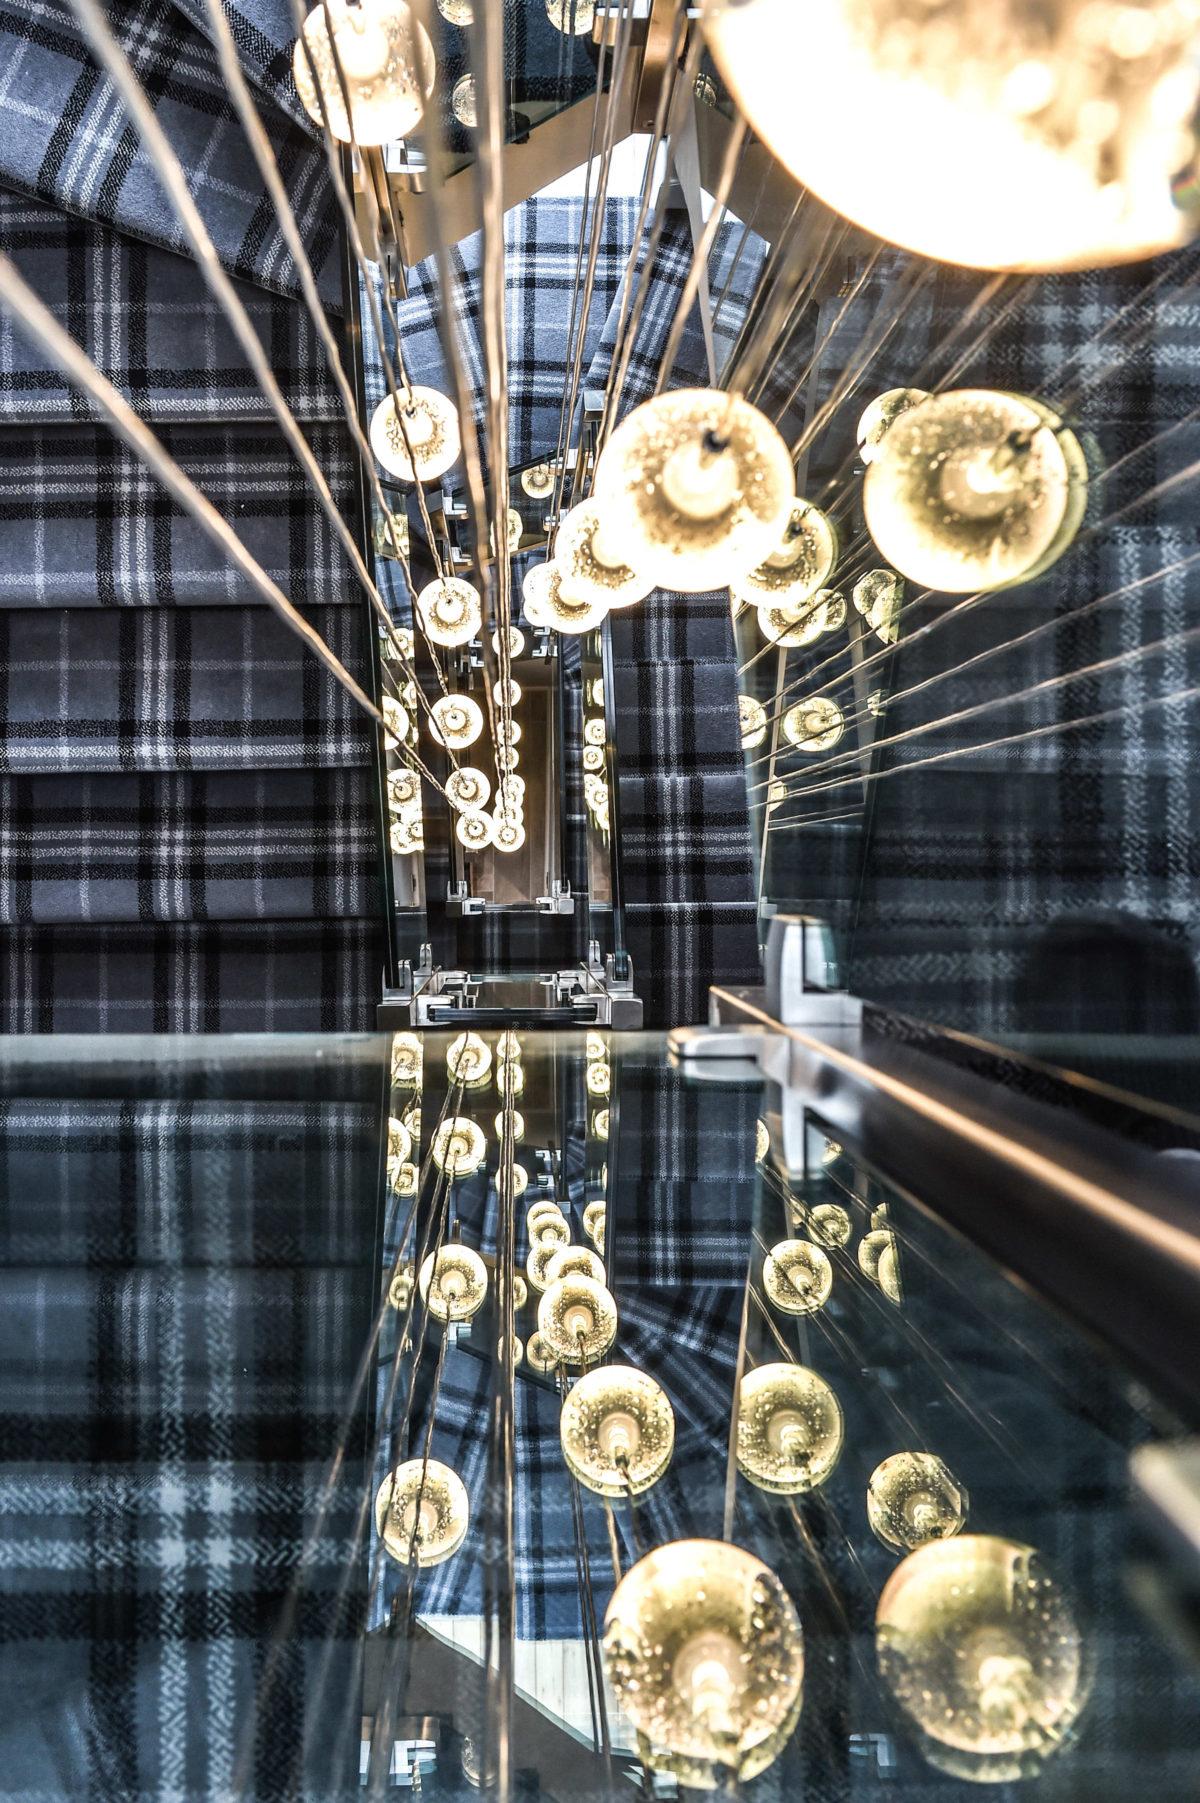 https://chevallier-architectes.fr/content/uploads/2018/01/Hôtel-Slalom36-1200x1803.jpg